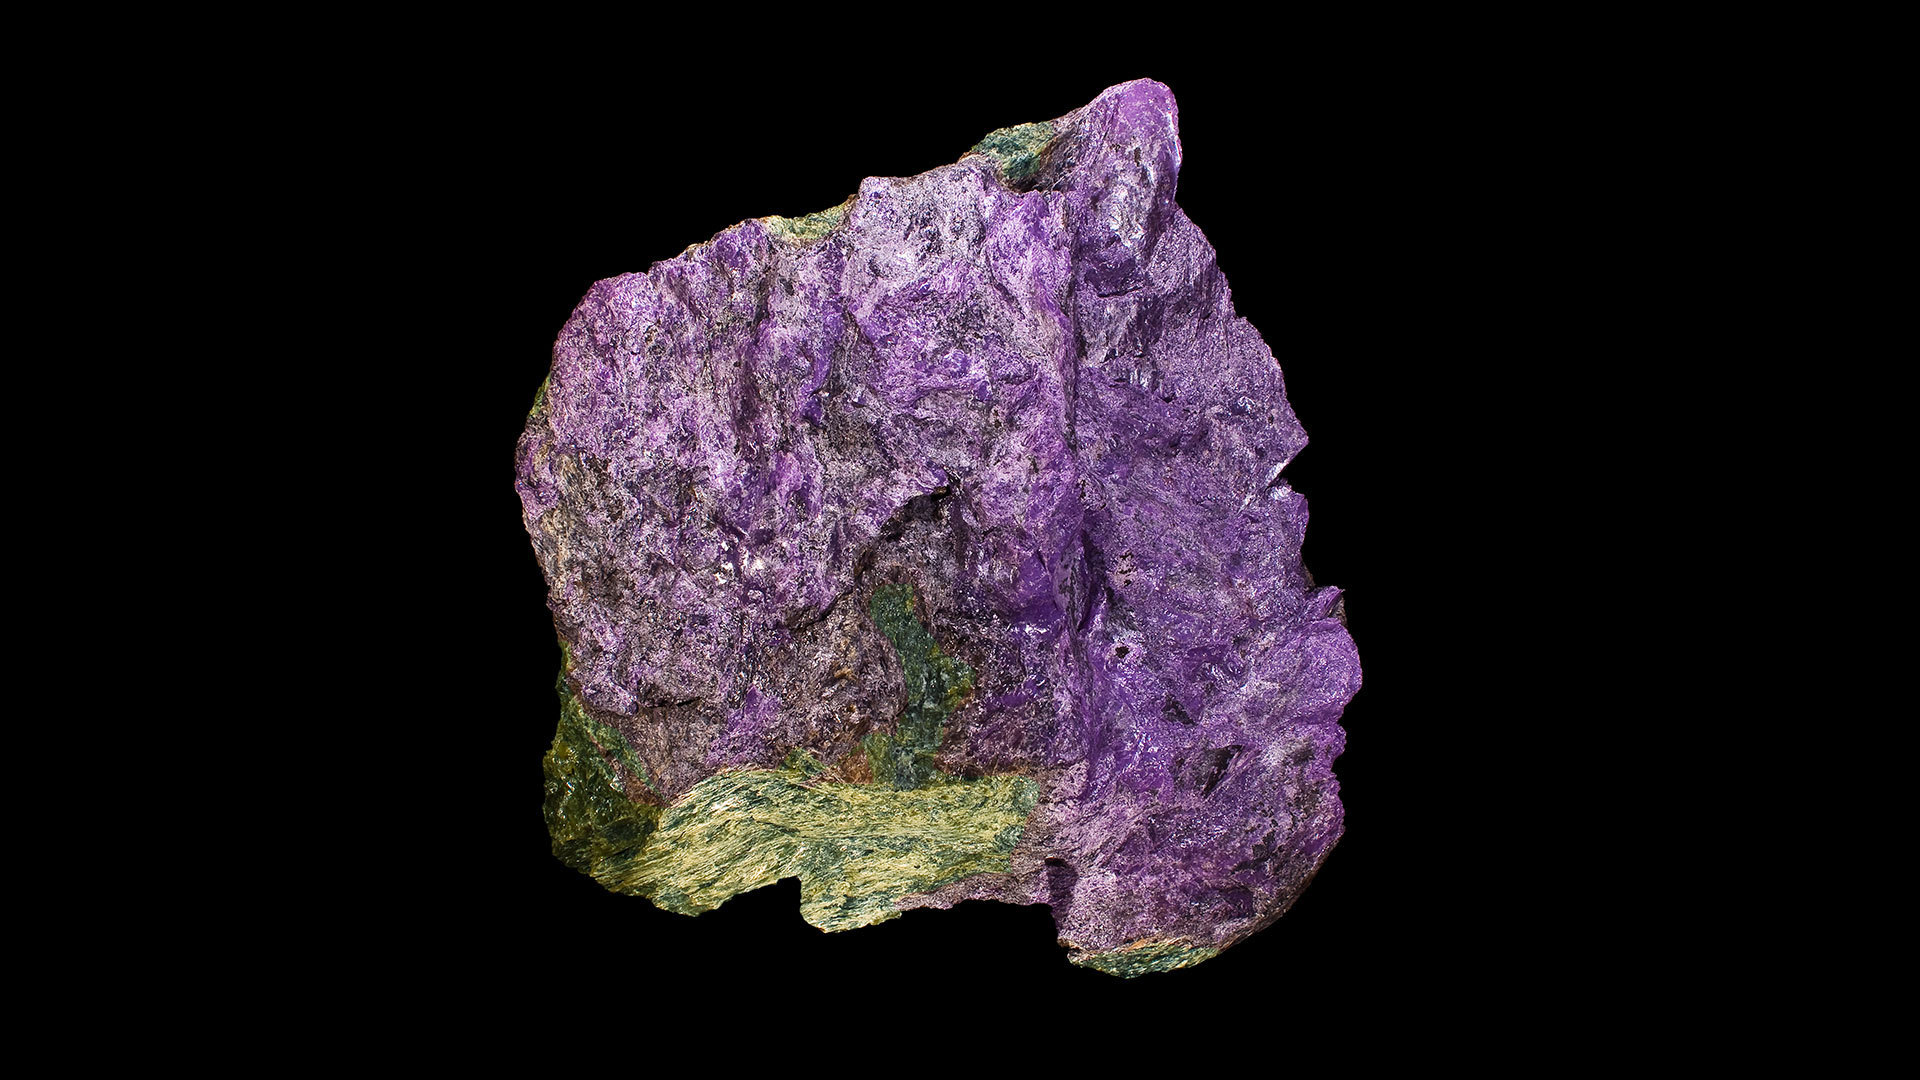 Stichtite Mineral Specimen - Original Photo by Didier Descouens